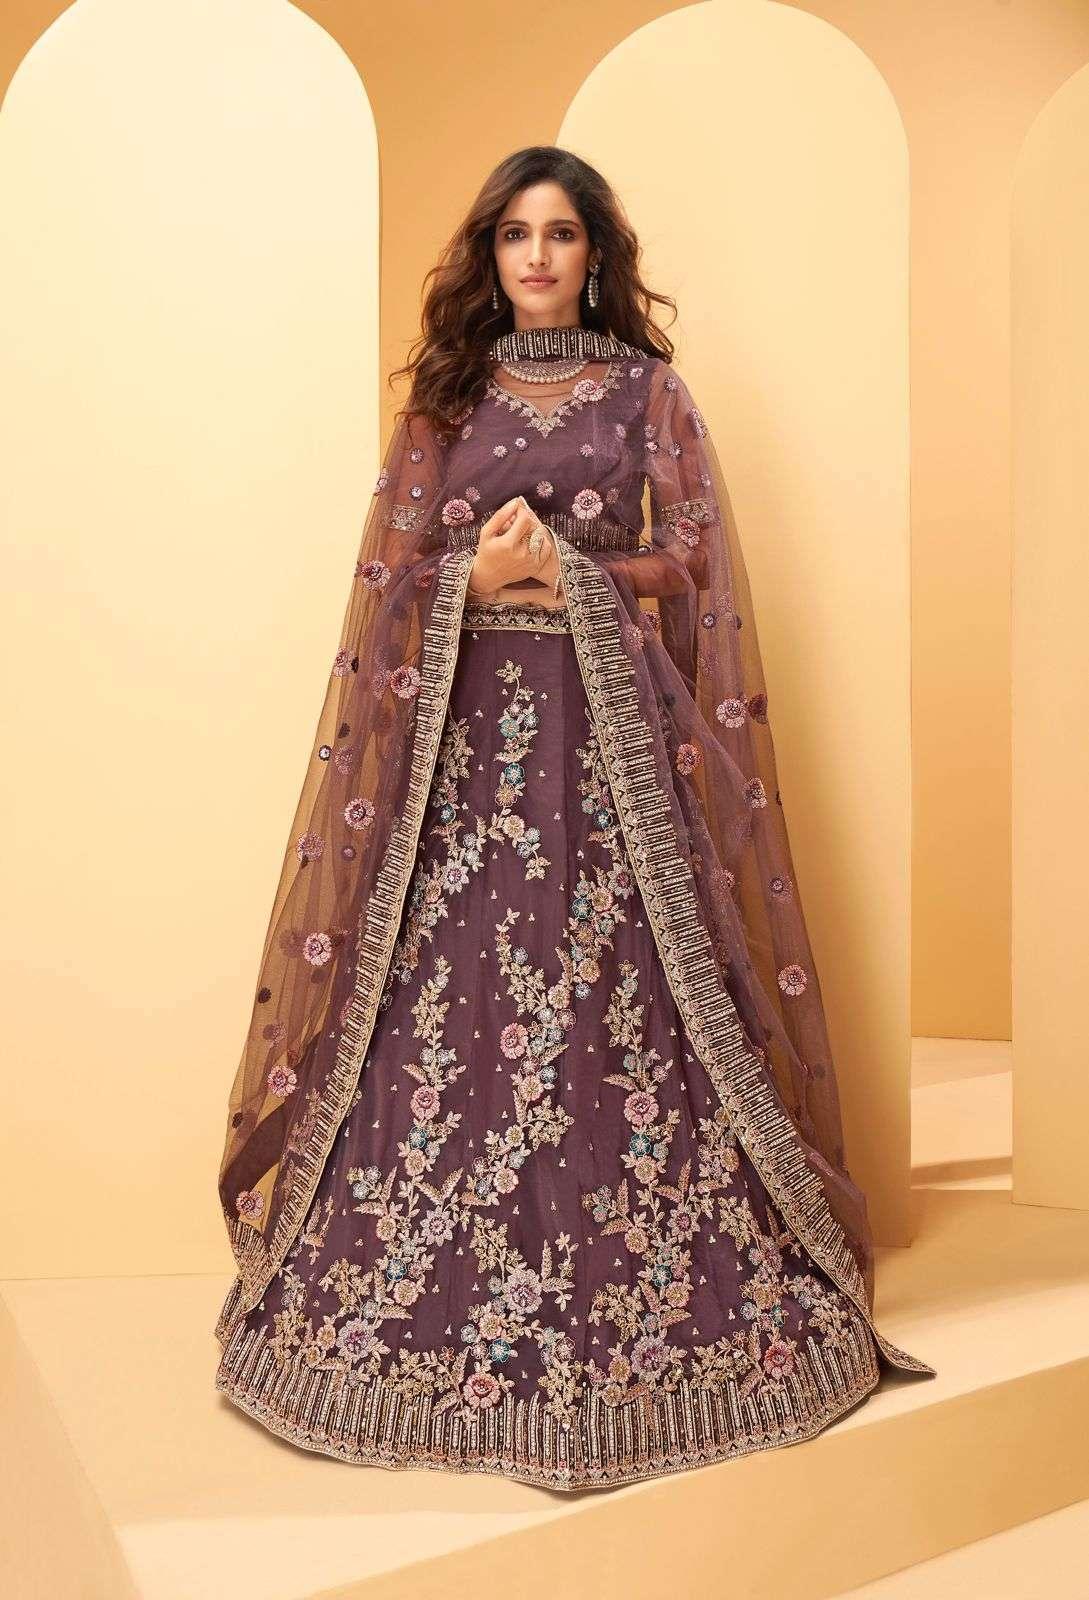 Alizeh Sangeet Vol 2 Silk With Embroidery Thread Work Designer Lehenga Choli Collection  1024